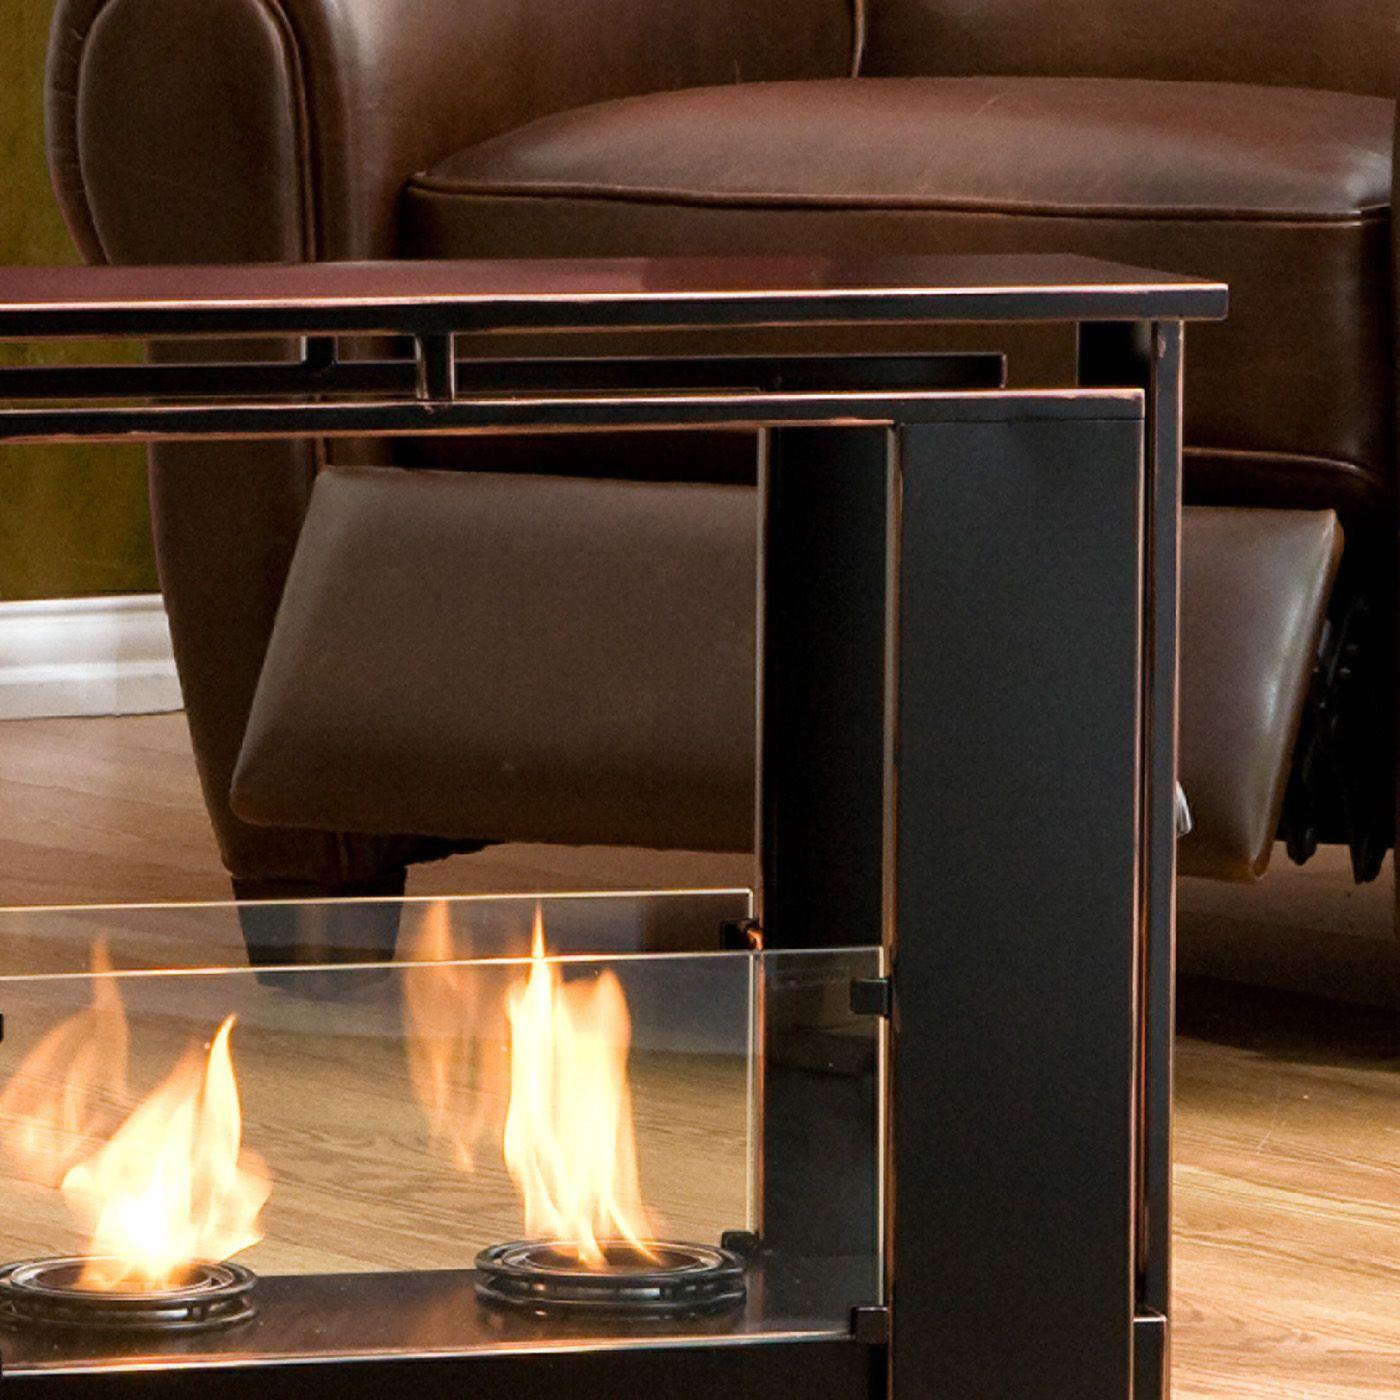 Wildon Home Kilgore Portable Gel Fuel Fireplace Indoor Outdoor Fireplaces Portable Fireplace Indoor Fireplace